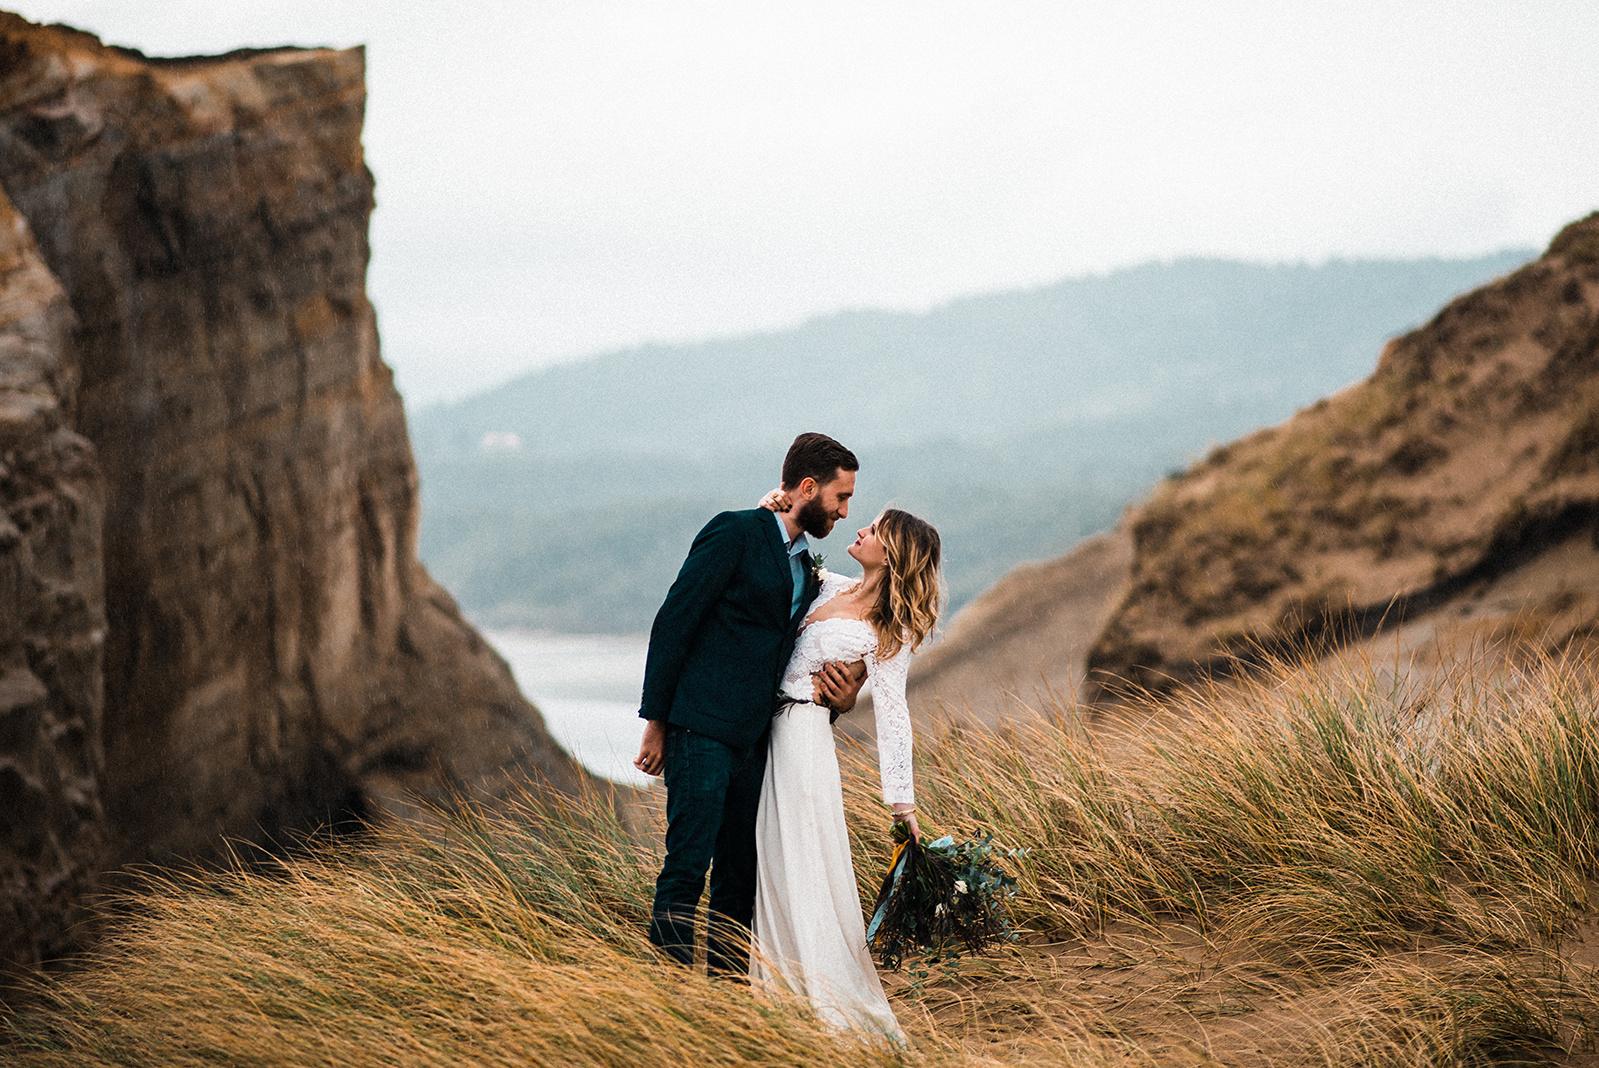 Oregon_Coast_Elopement_Wedding_The_Foxes_Photography_099.jpg